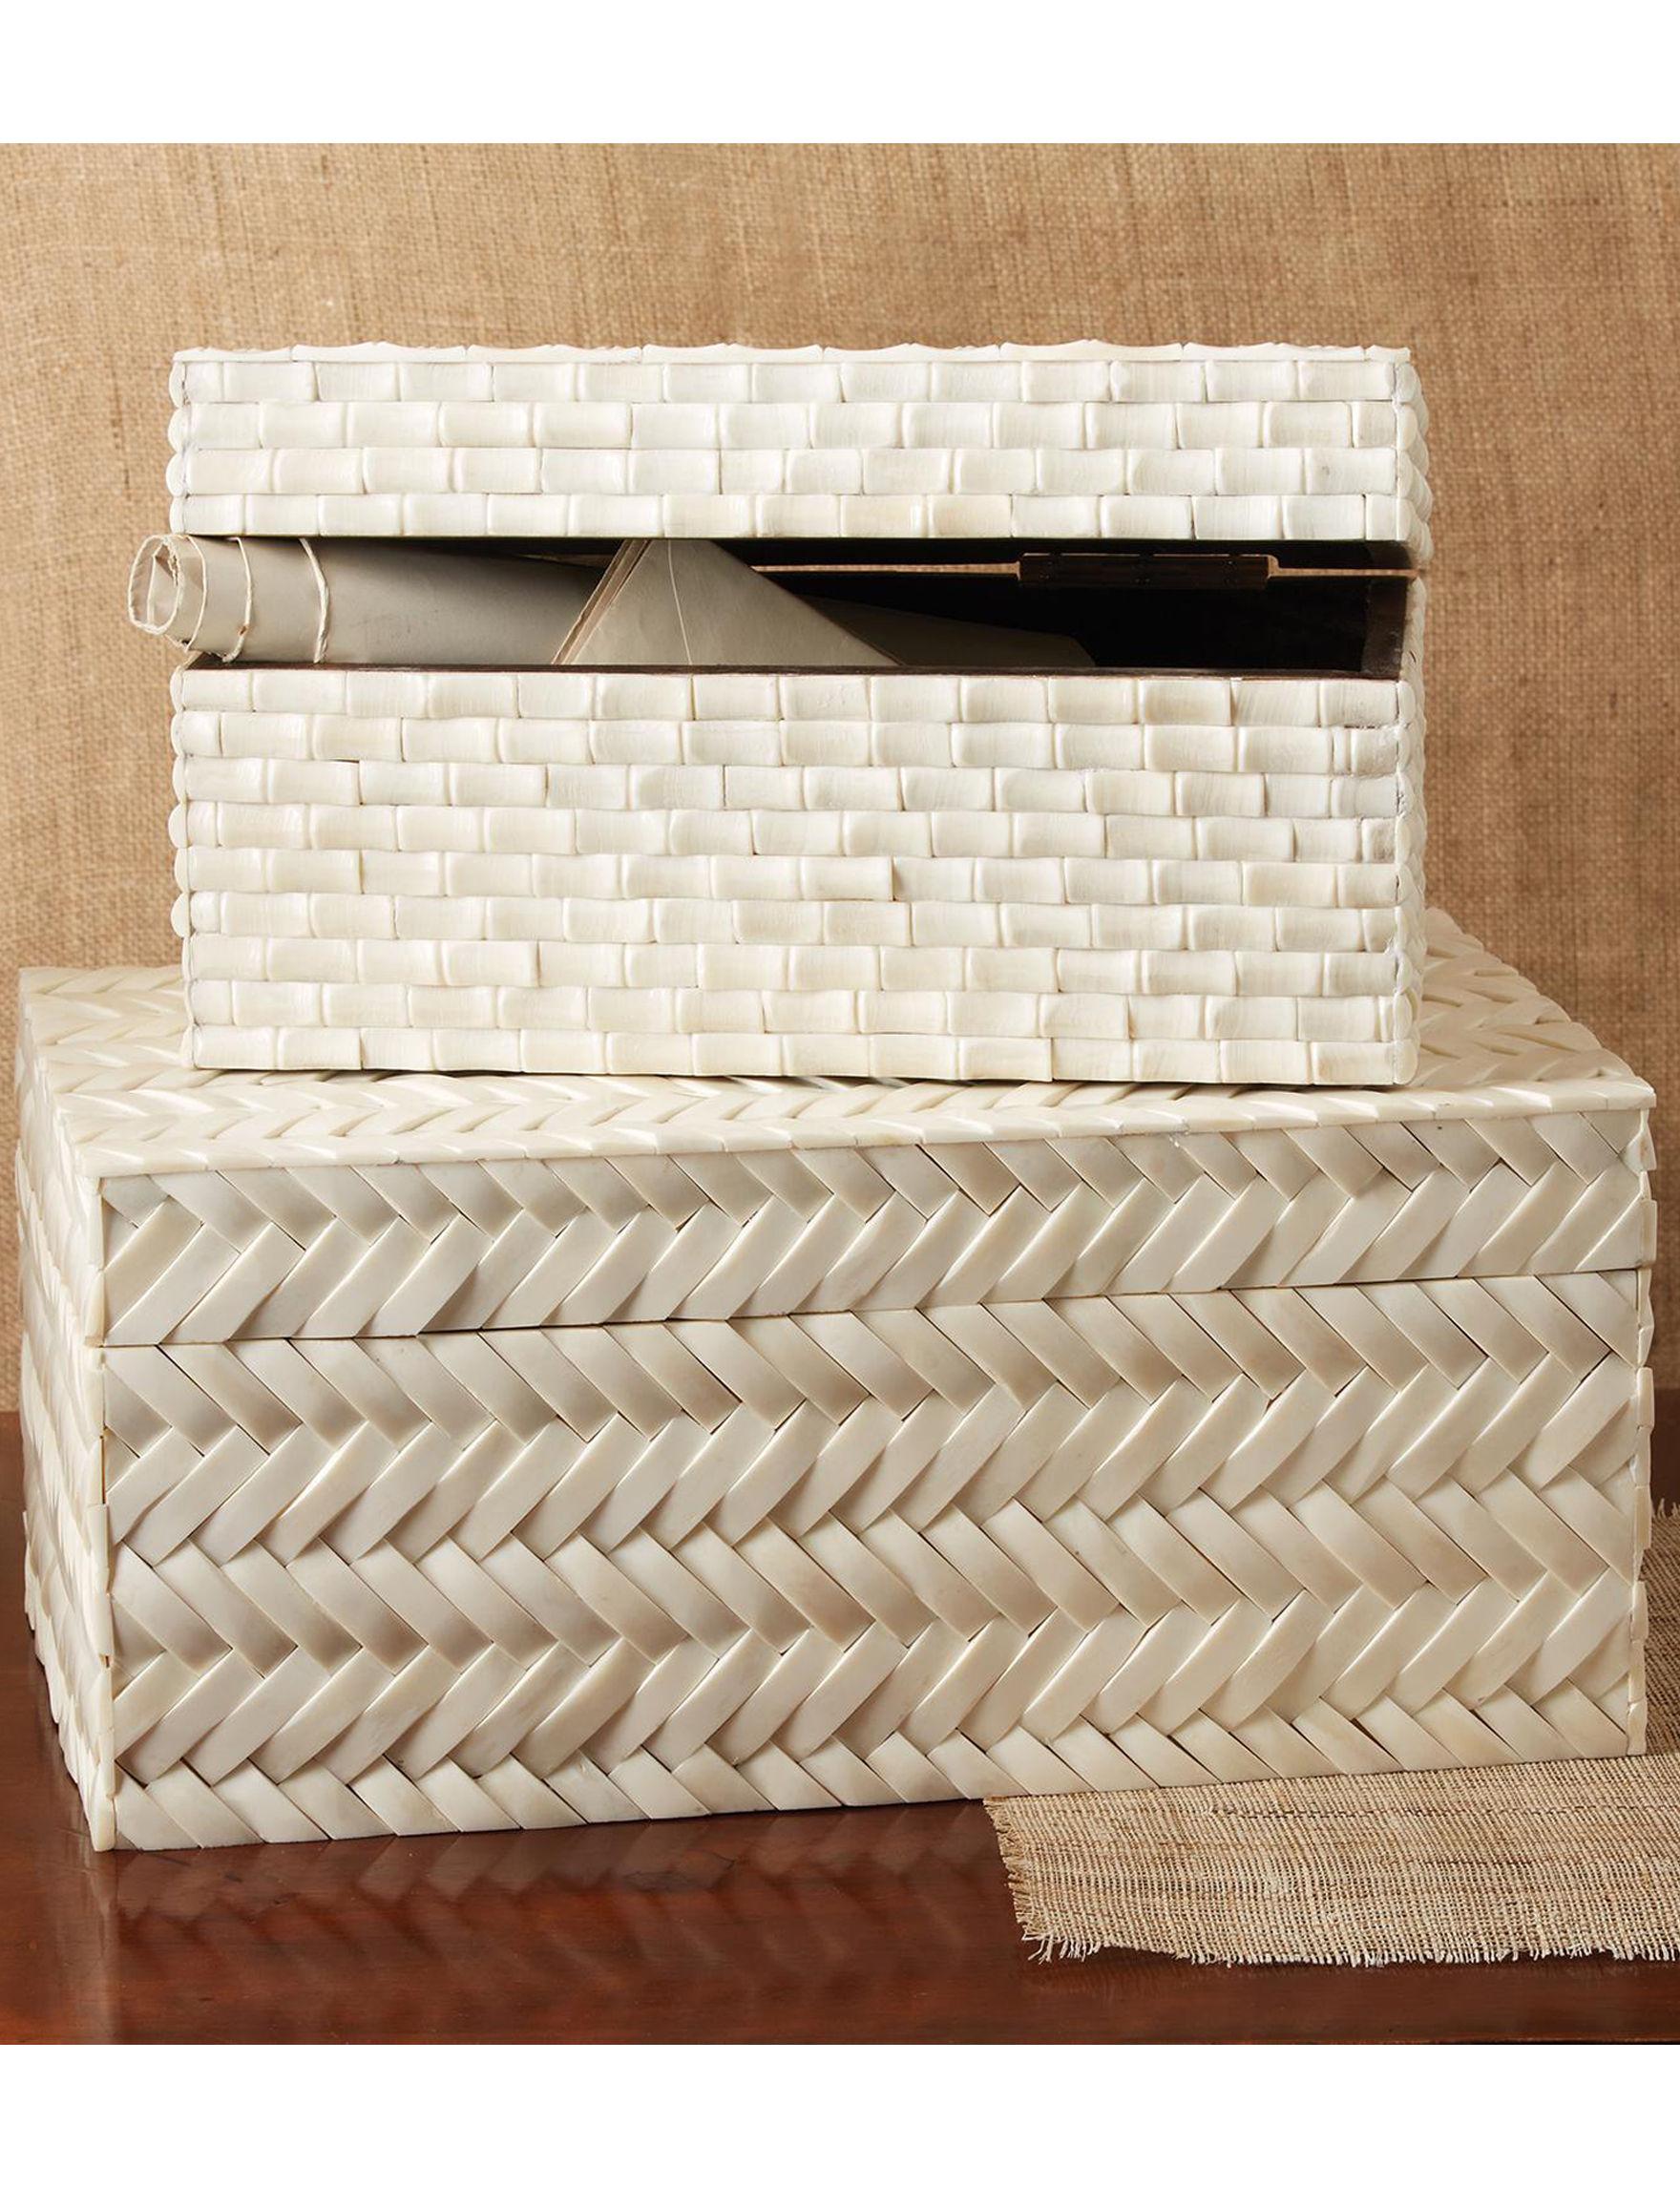 Two's Company White Storage Bags & Boxes Storage & Organization